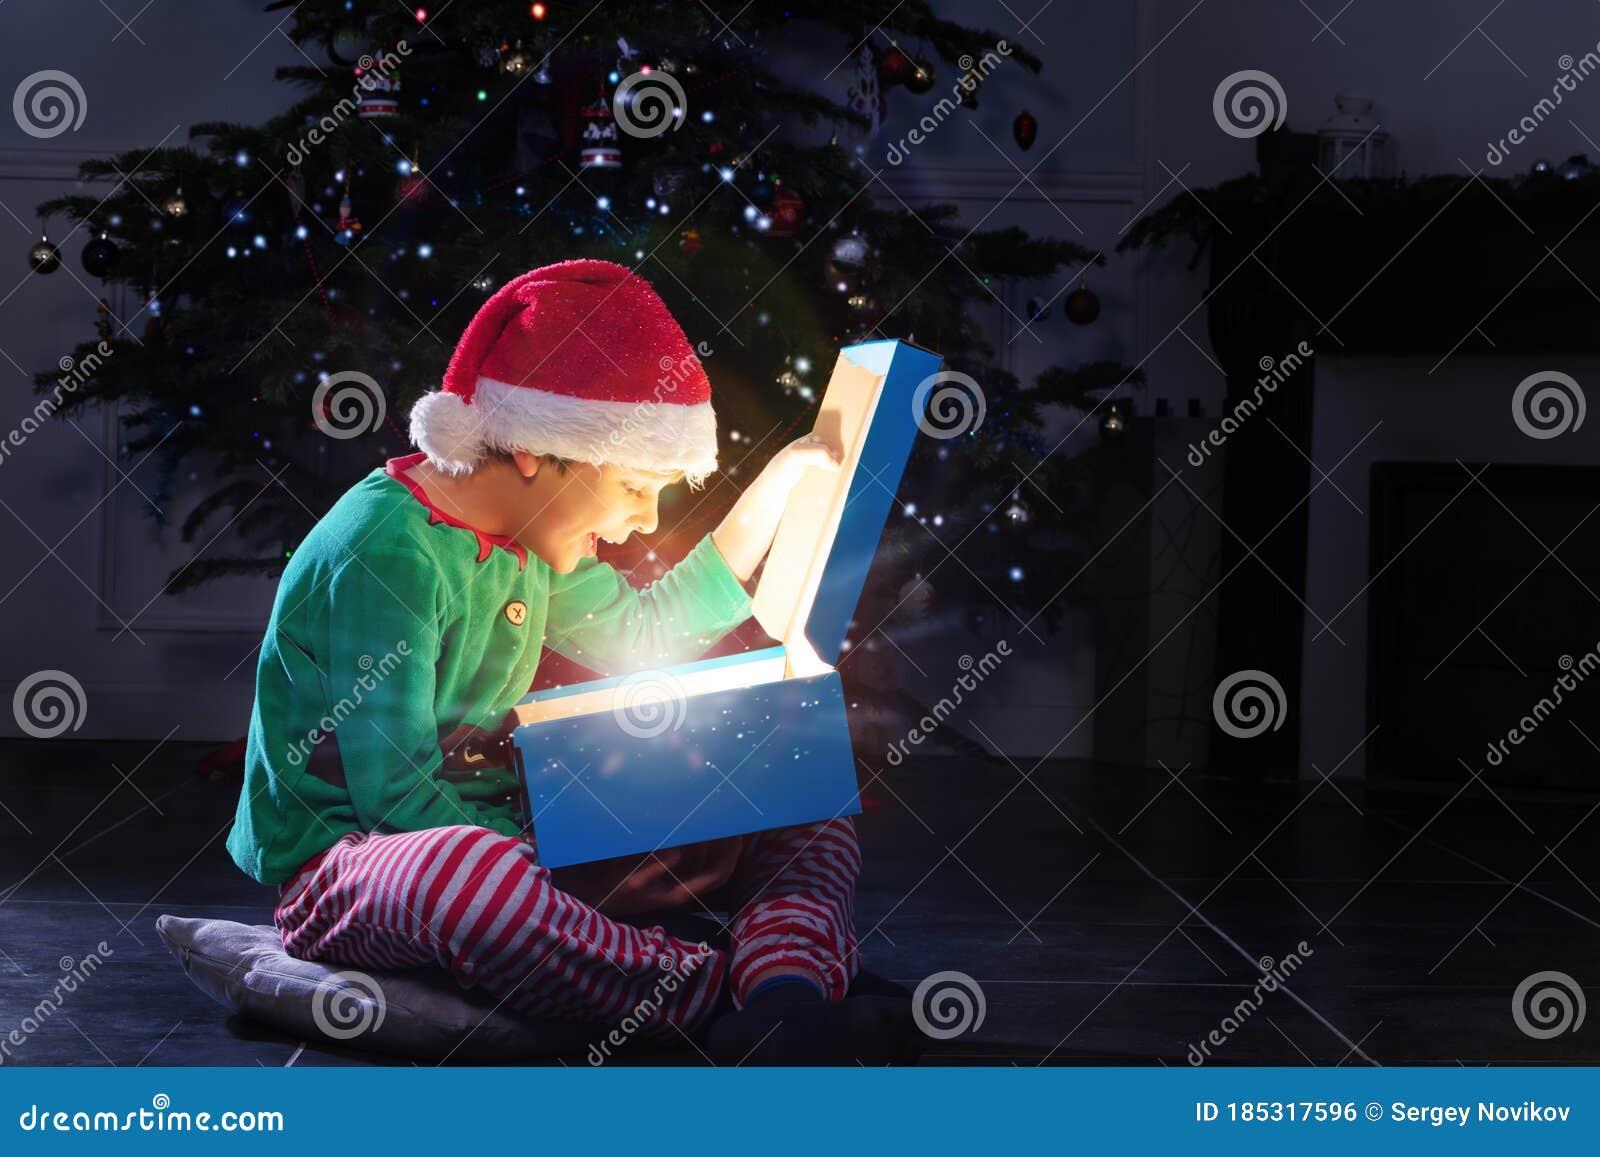 Boy Open Glowing Present Box Near Christmas Tree Stock Photo - Image of kids, magical: 185317596